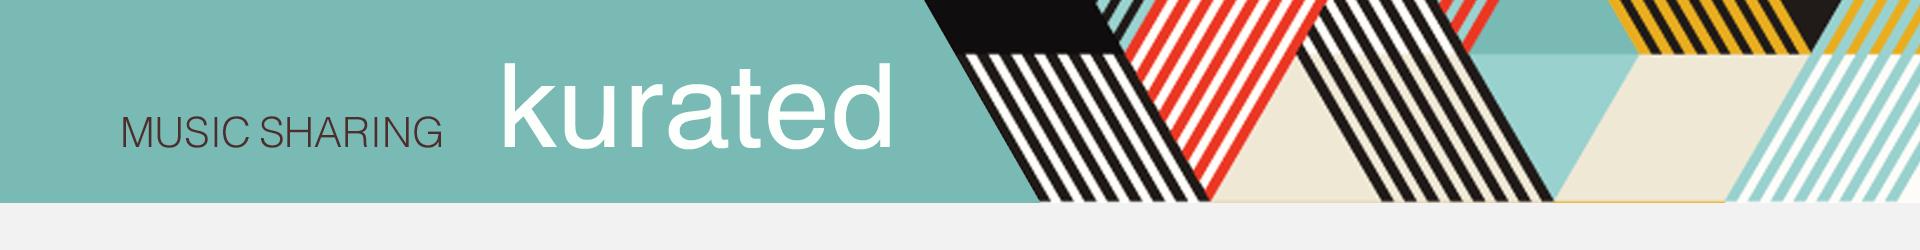 15 B Kurated Banner Helvetica Geometric